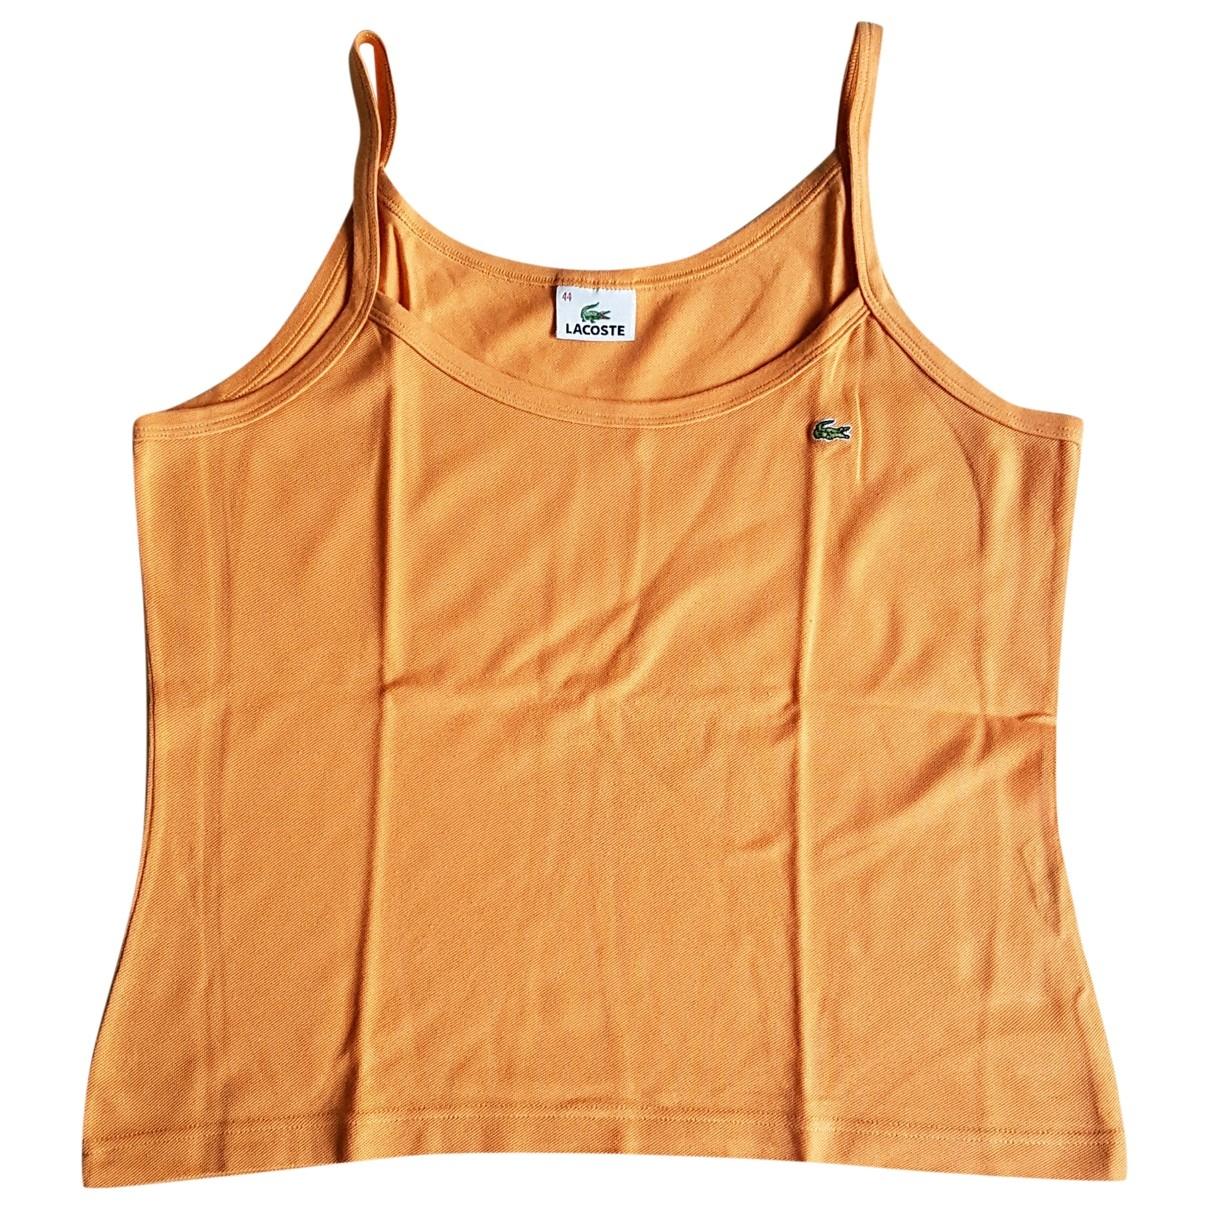 Camiseta de tirantes Lacoste